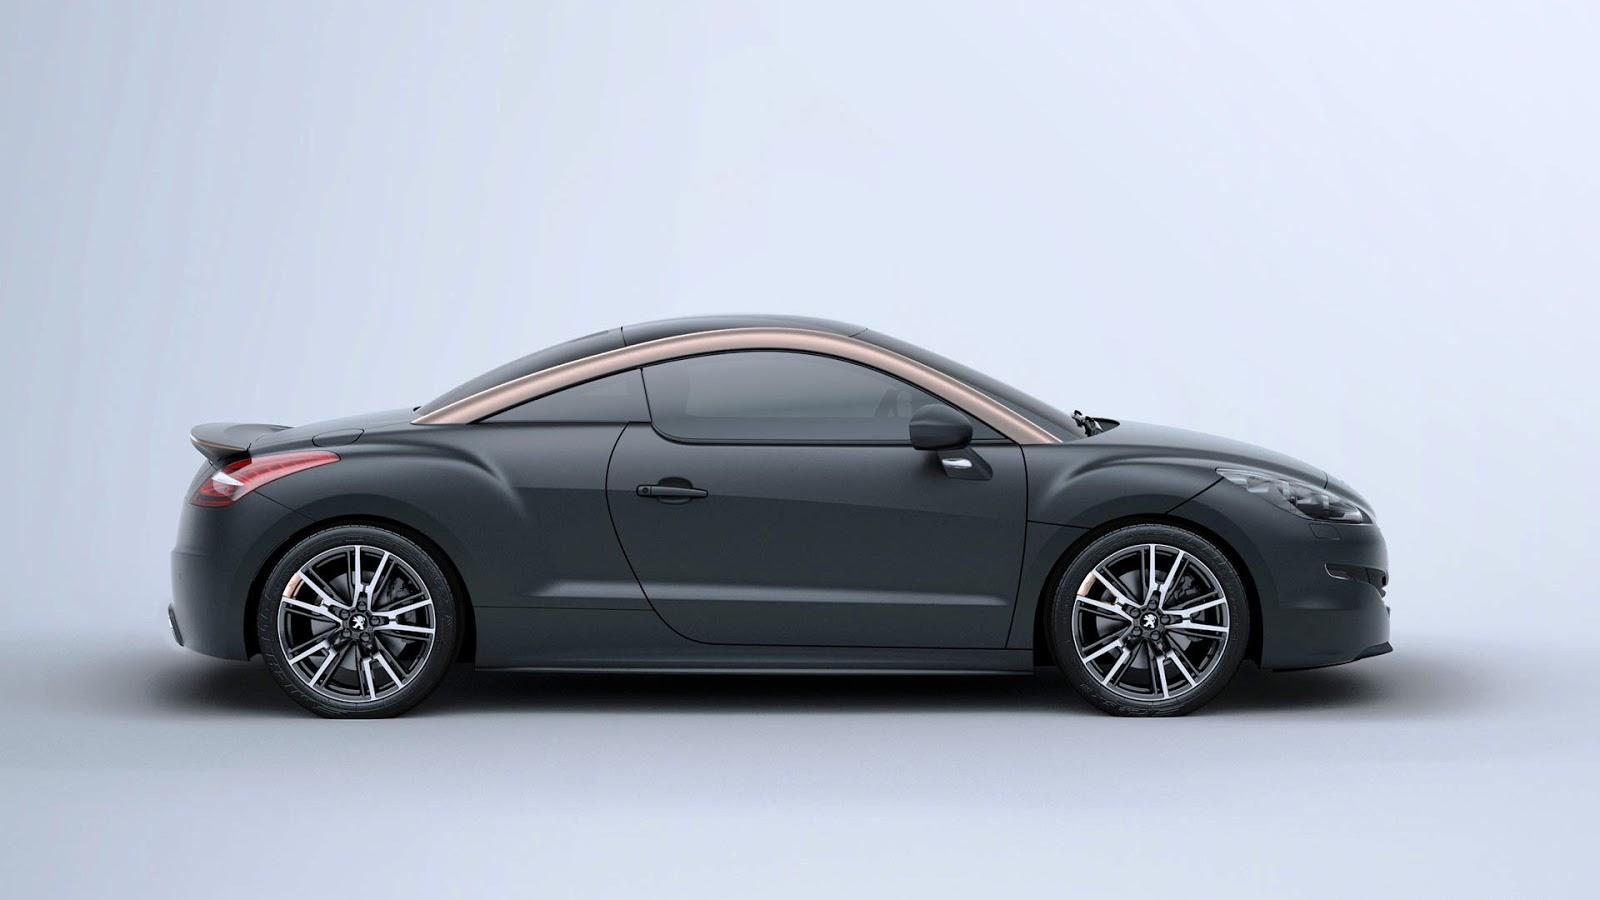 full hd exotic car wallpapers 2012 peugeot rcz r concept. Black Bedroom Furniture Sets. Home Design Ideas